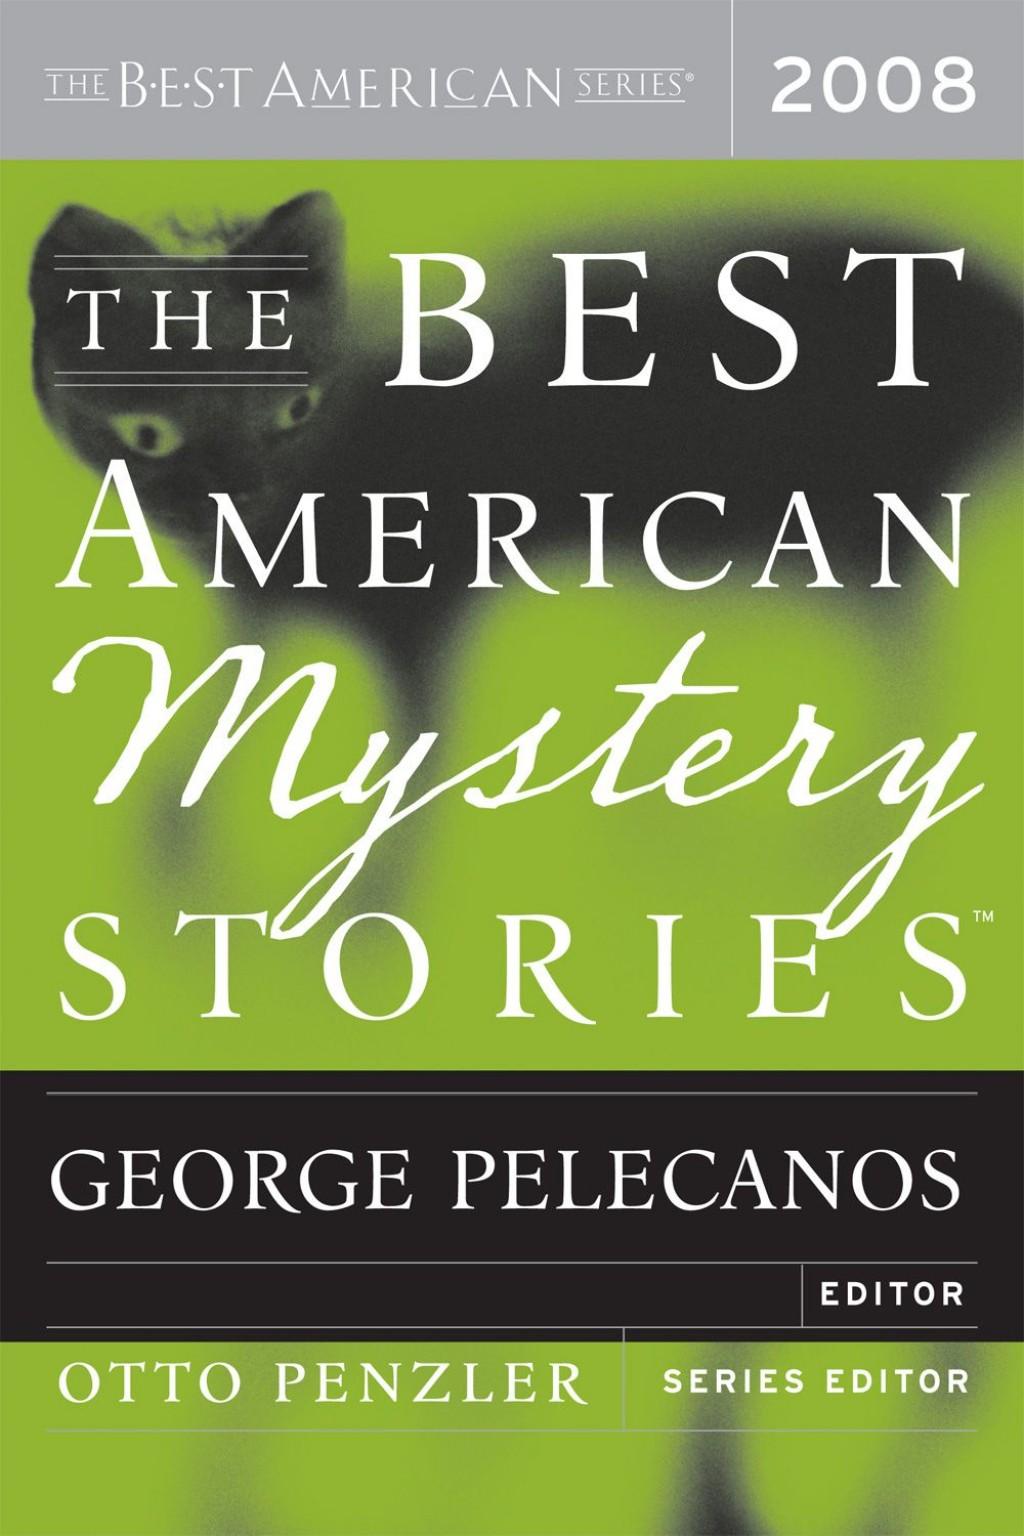 018 Ftnewbooks26 The Best American Essays Of Century Essay Imposing Joyce Carol Oates Pdf Table Contents Large